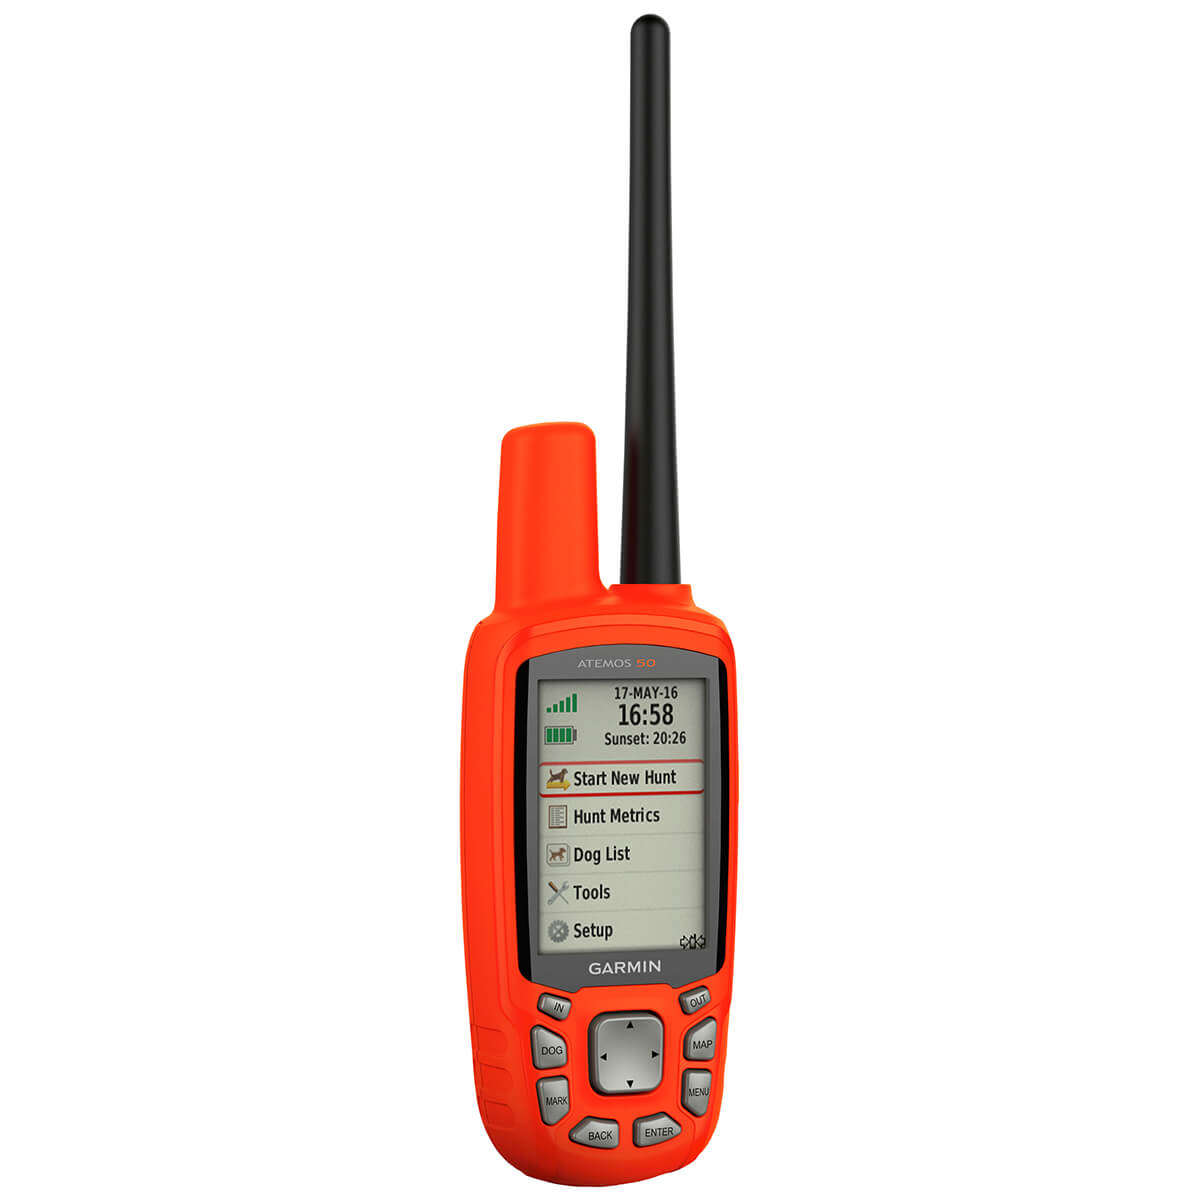 Garmin GPS-Ortungsgerät Atemos 50+ K5 Bundle